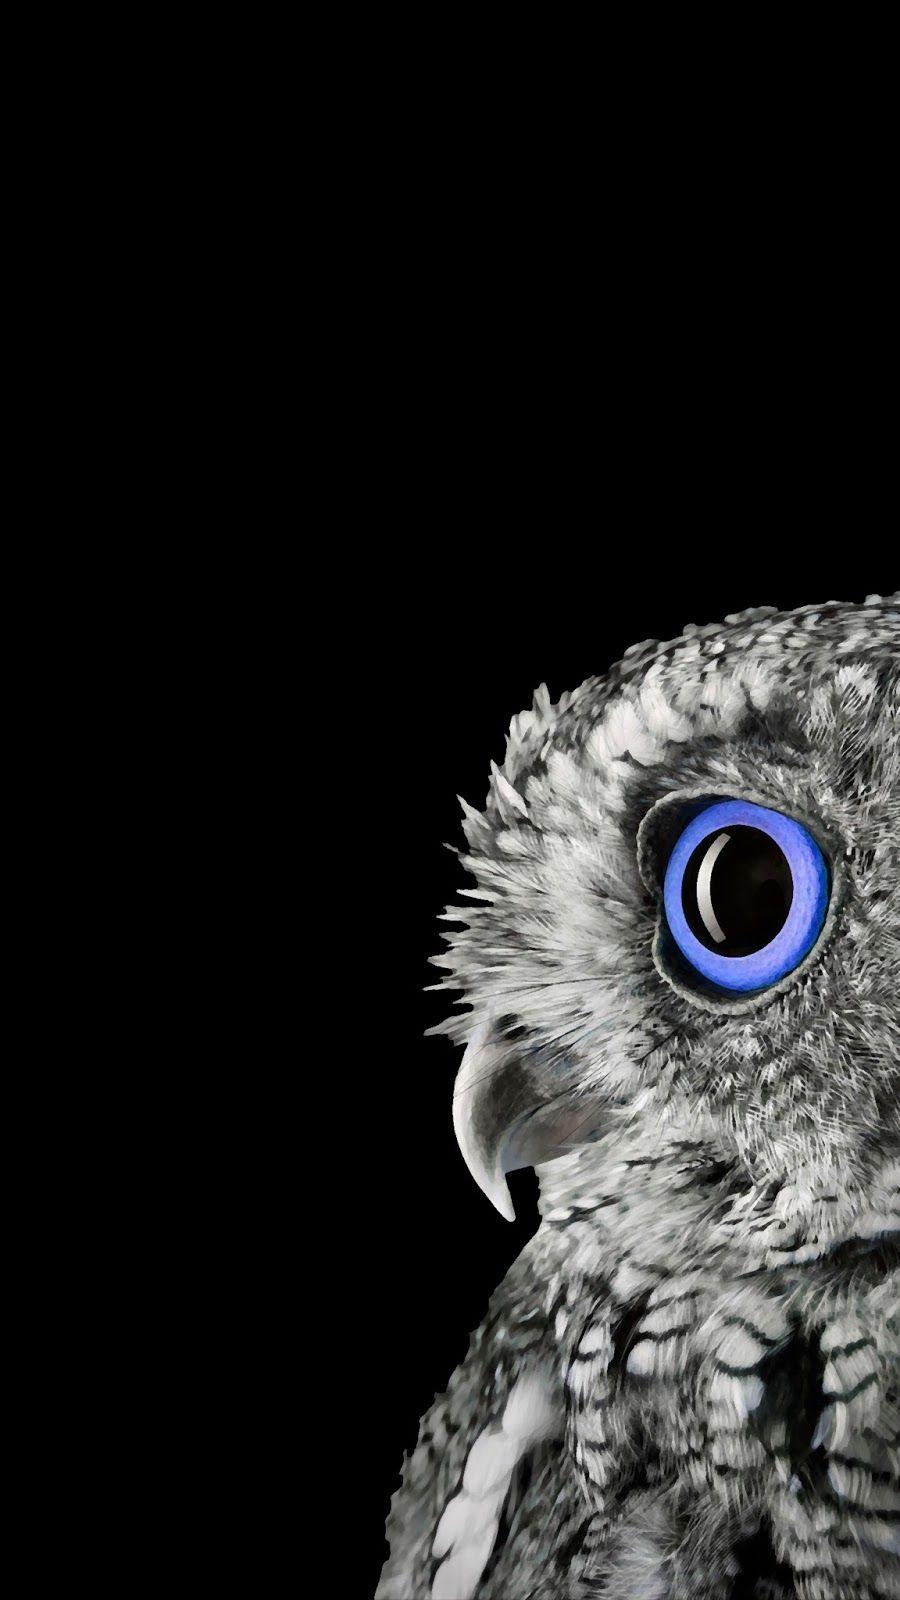 Blue Eye Owl Wallpaper Owl Wallpaper Owl Wall Art Galaxy Phone Wallpaper